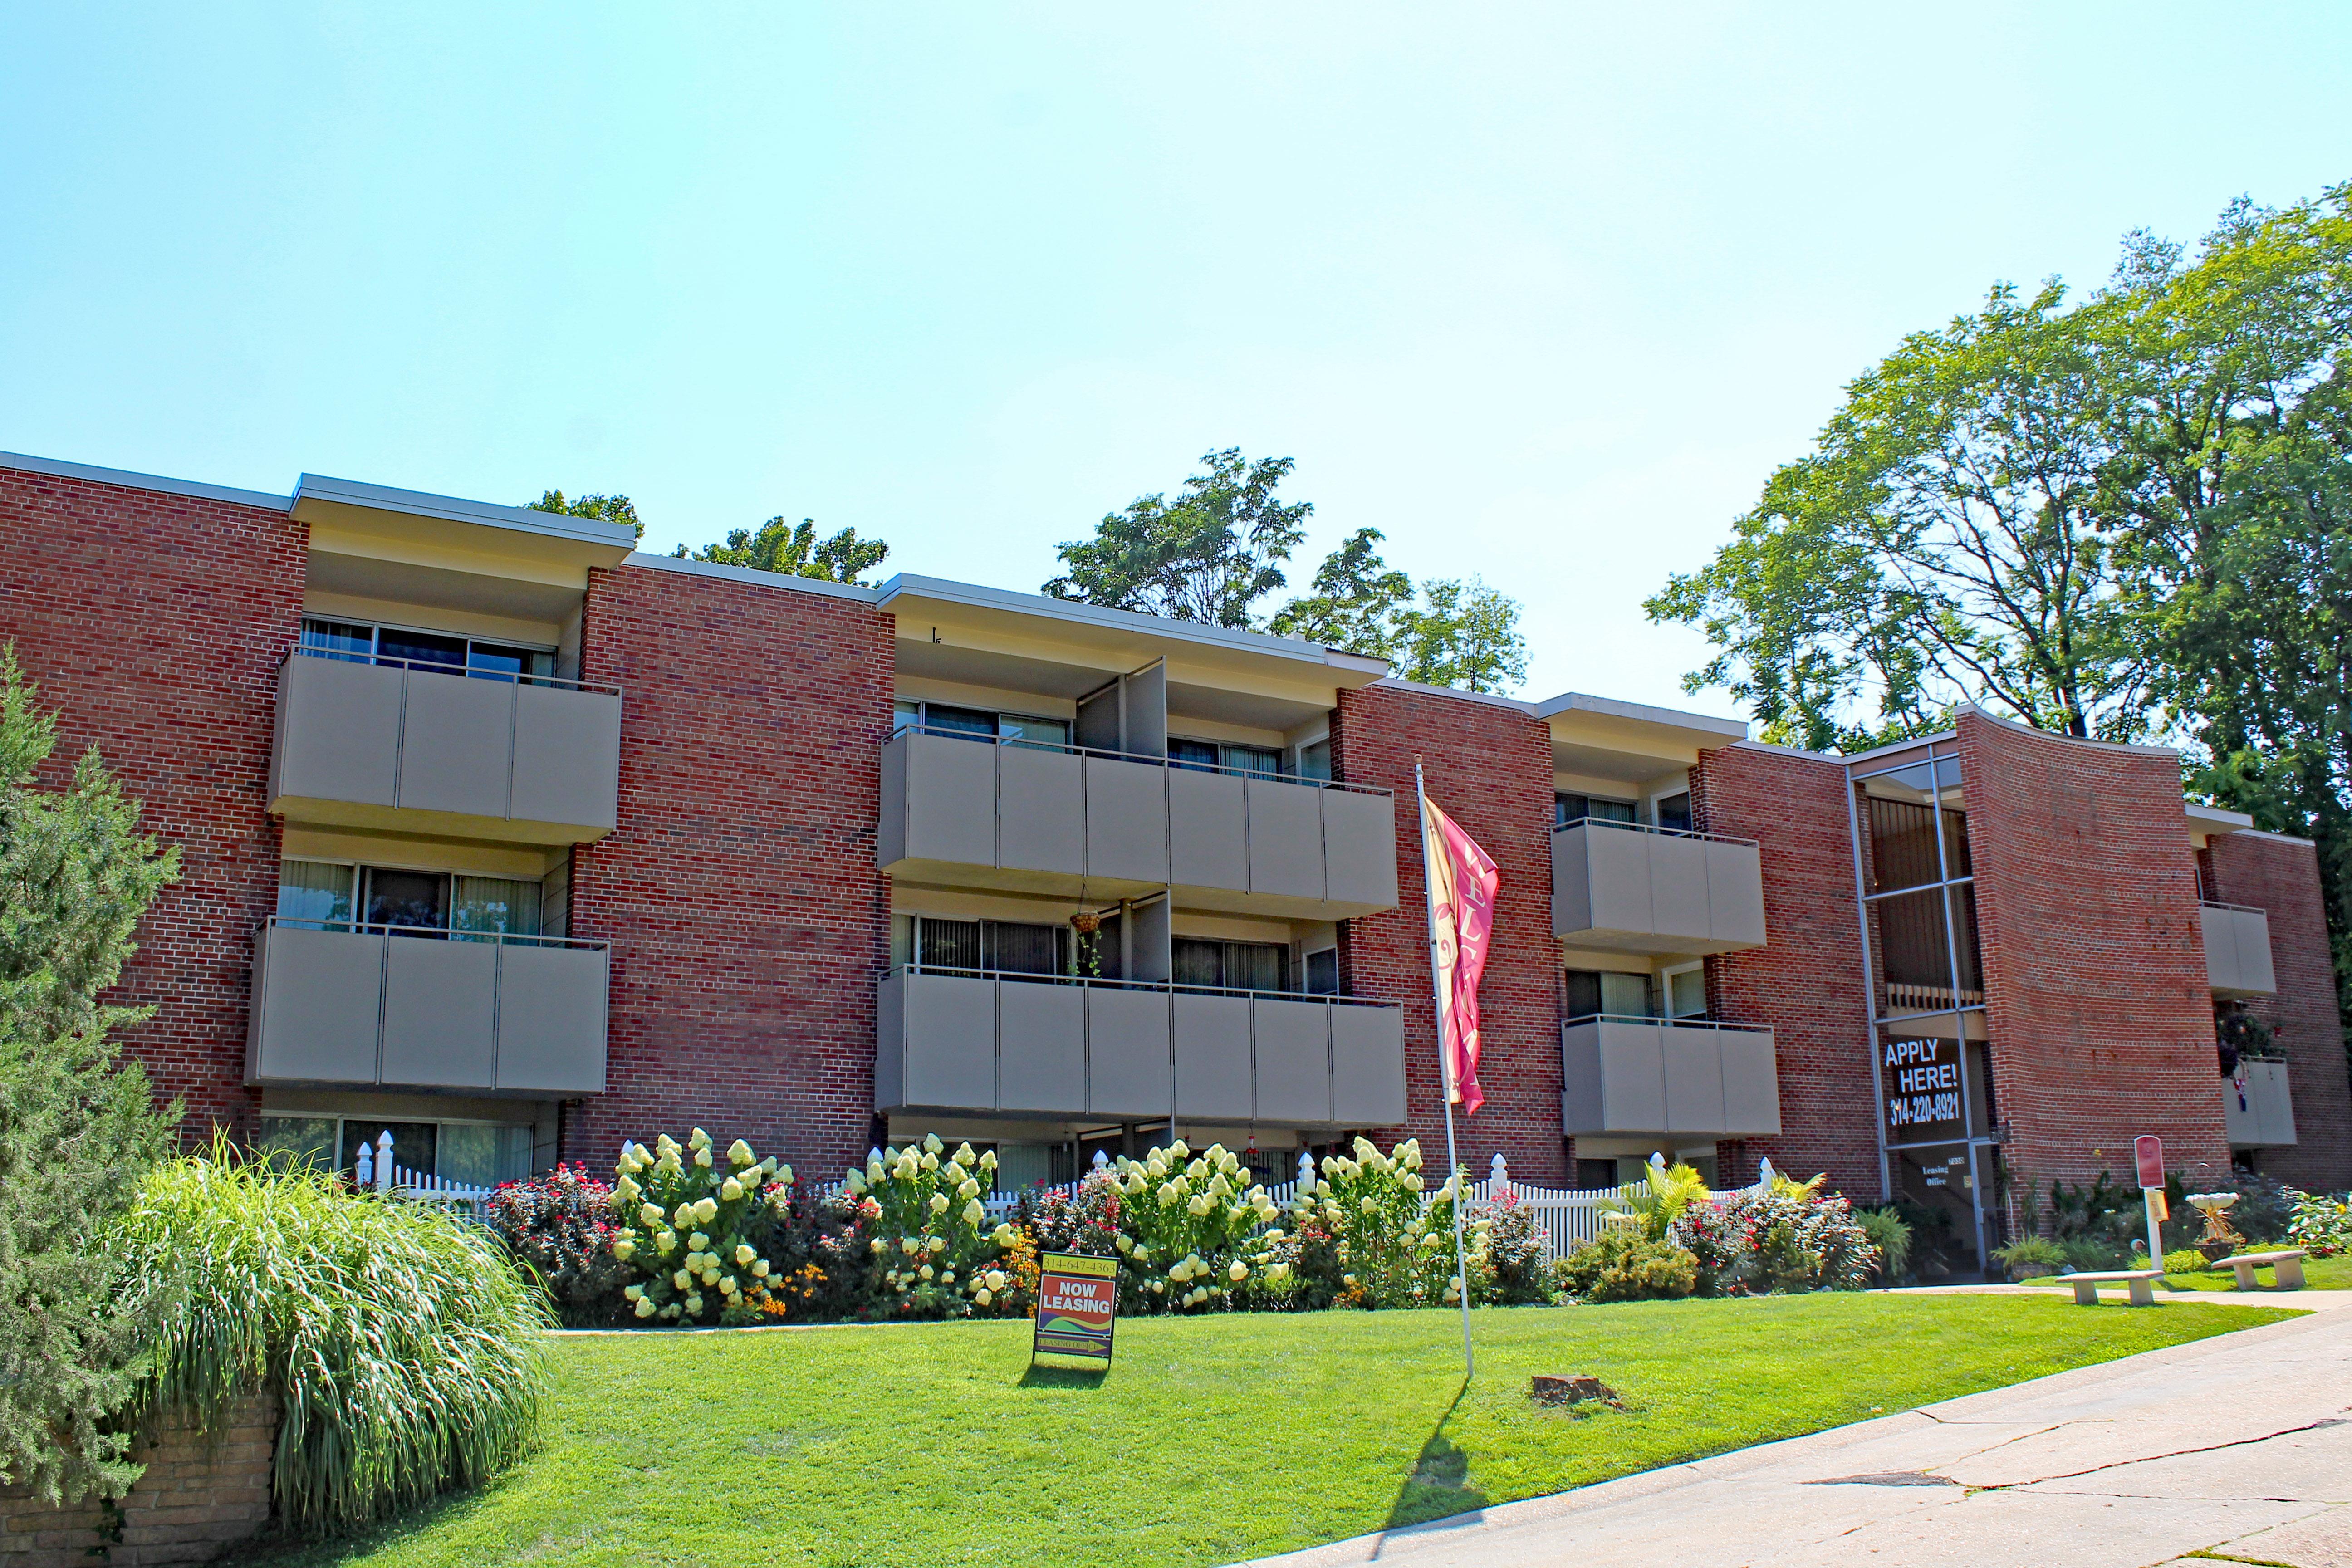 Geneva Apartments - National Real Estate Mgmt. Corp.